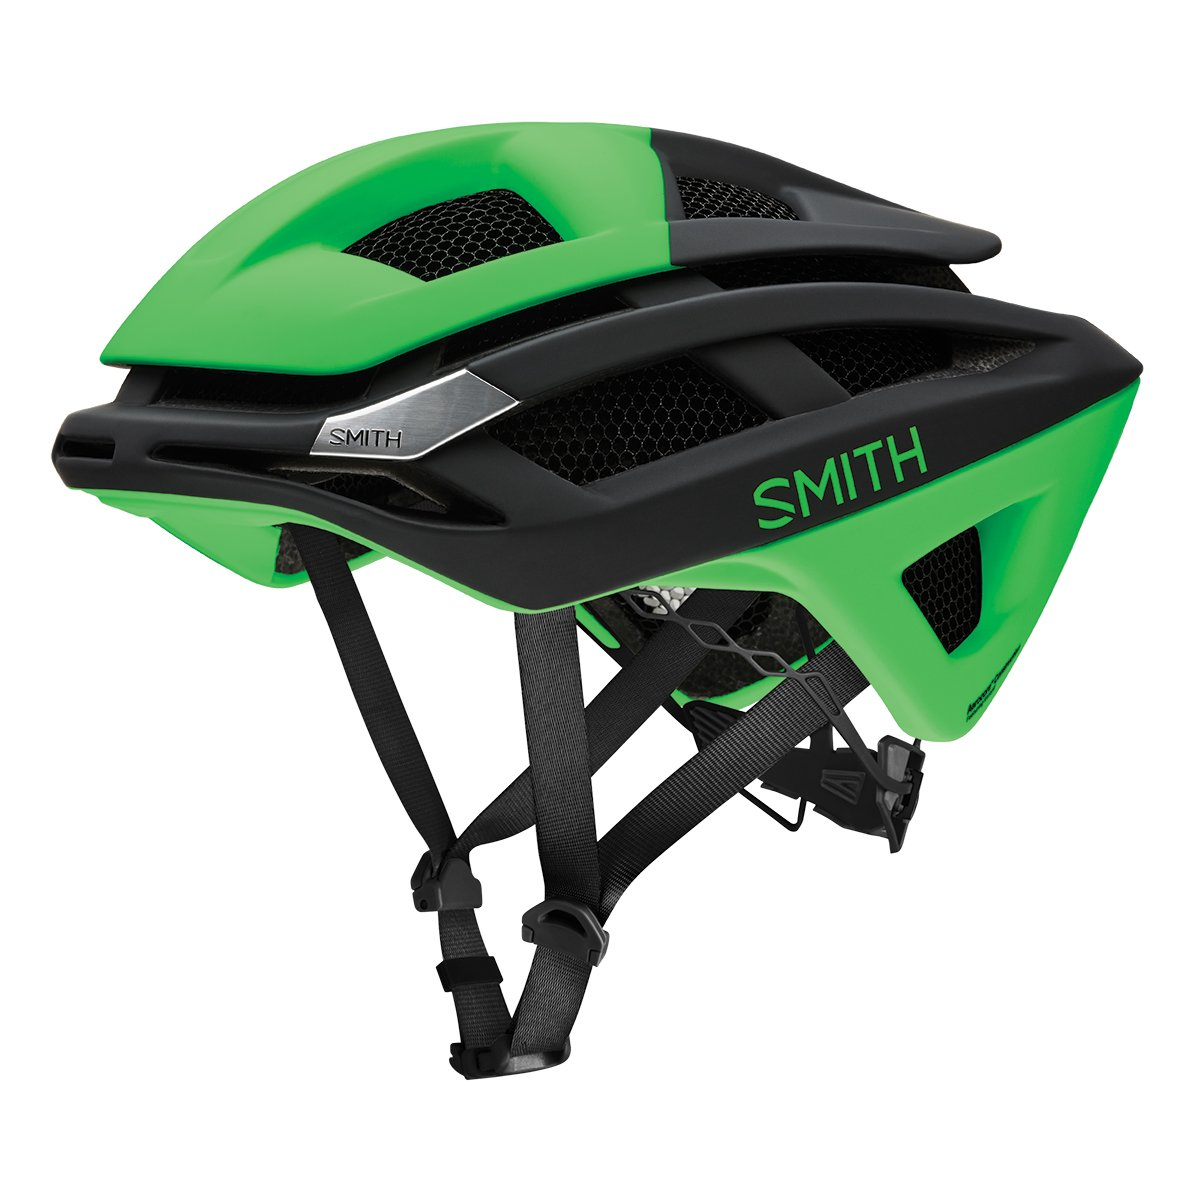 Smith Overtake MIPS casco mate Reactor Split, L: Amazon.es: Deportes y aire libre